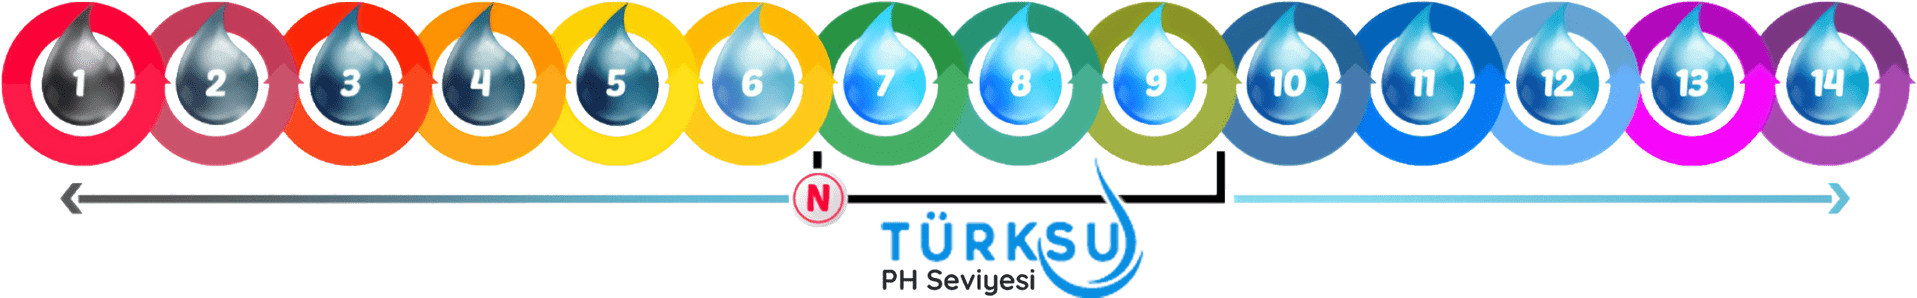 turk-su-aritma